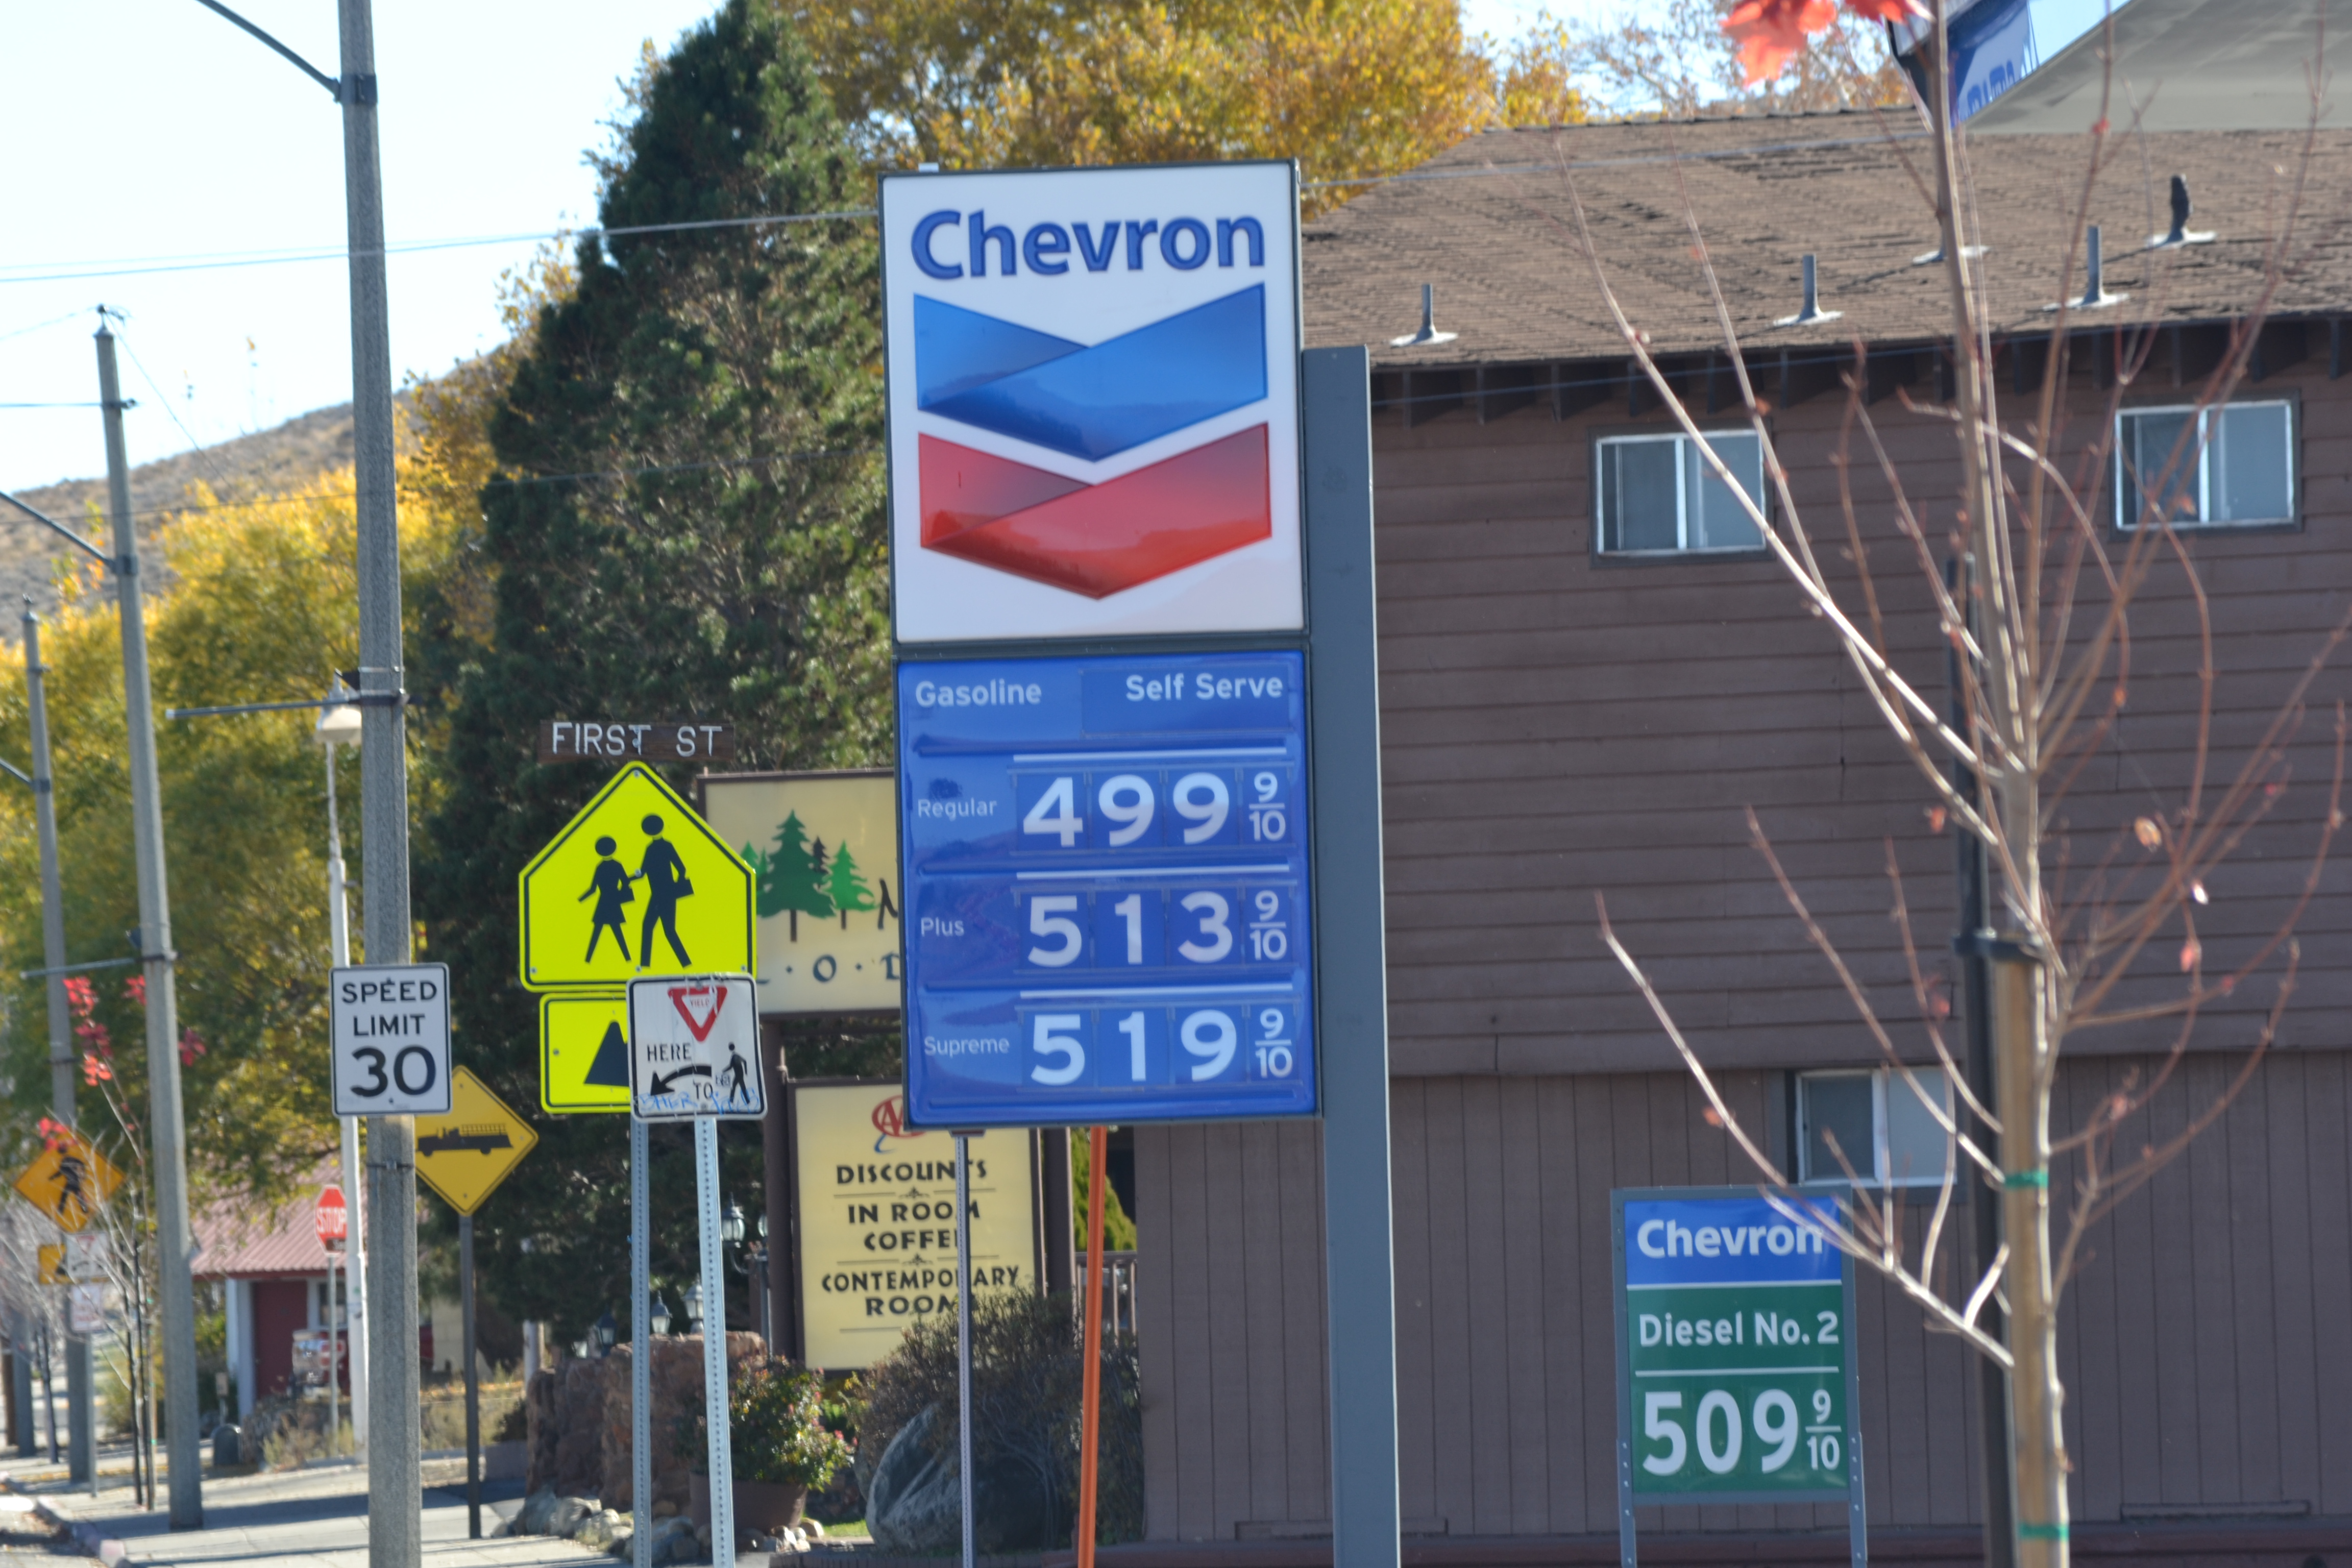 Lee Vining CA fuel prices